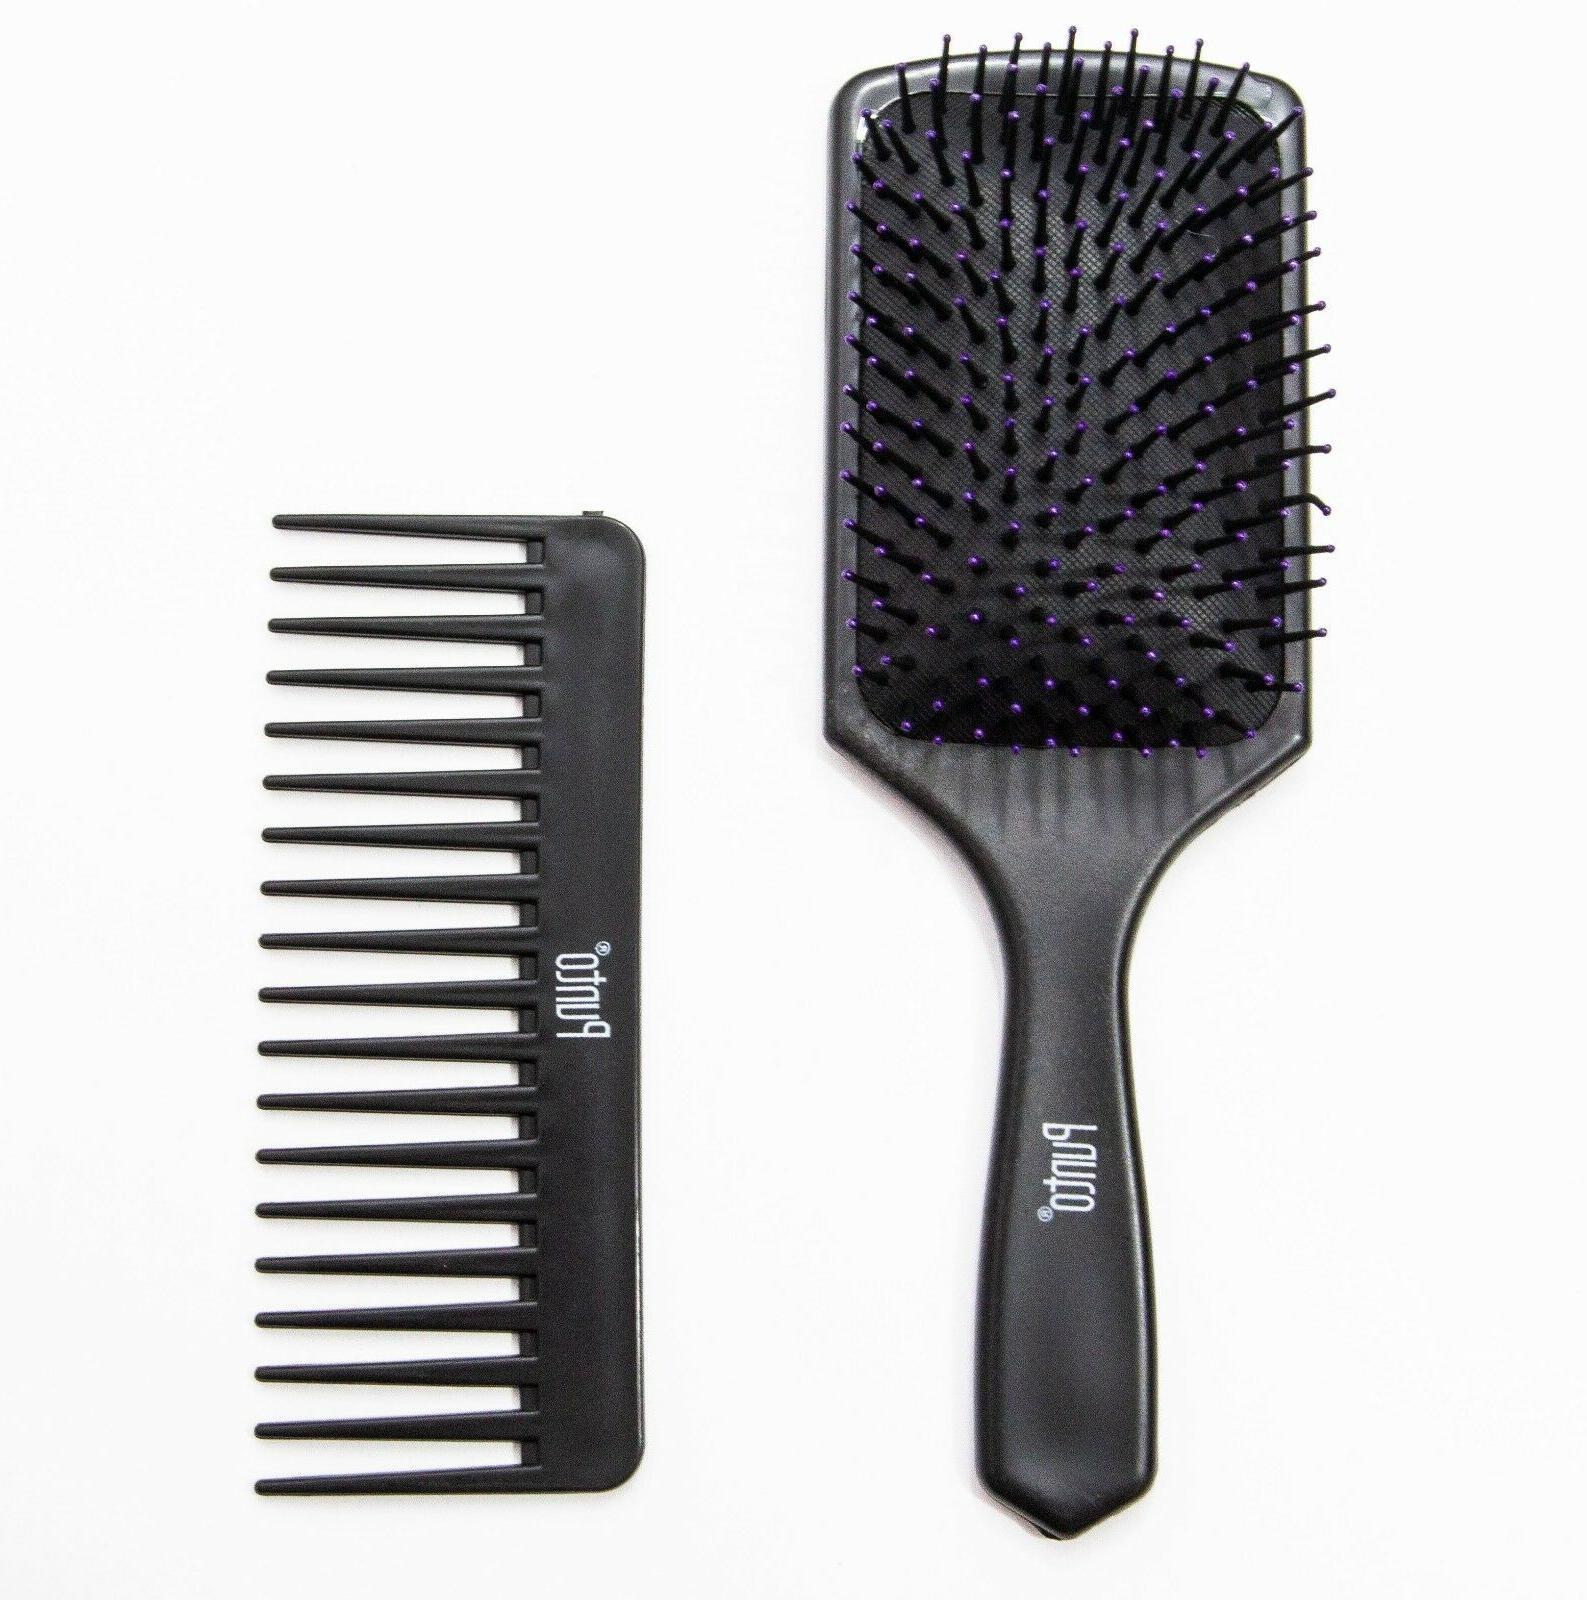 BRAND NEW PRO PADDLE HAIR BRUSH WIDE MASSAGE SCALP